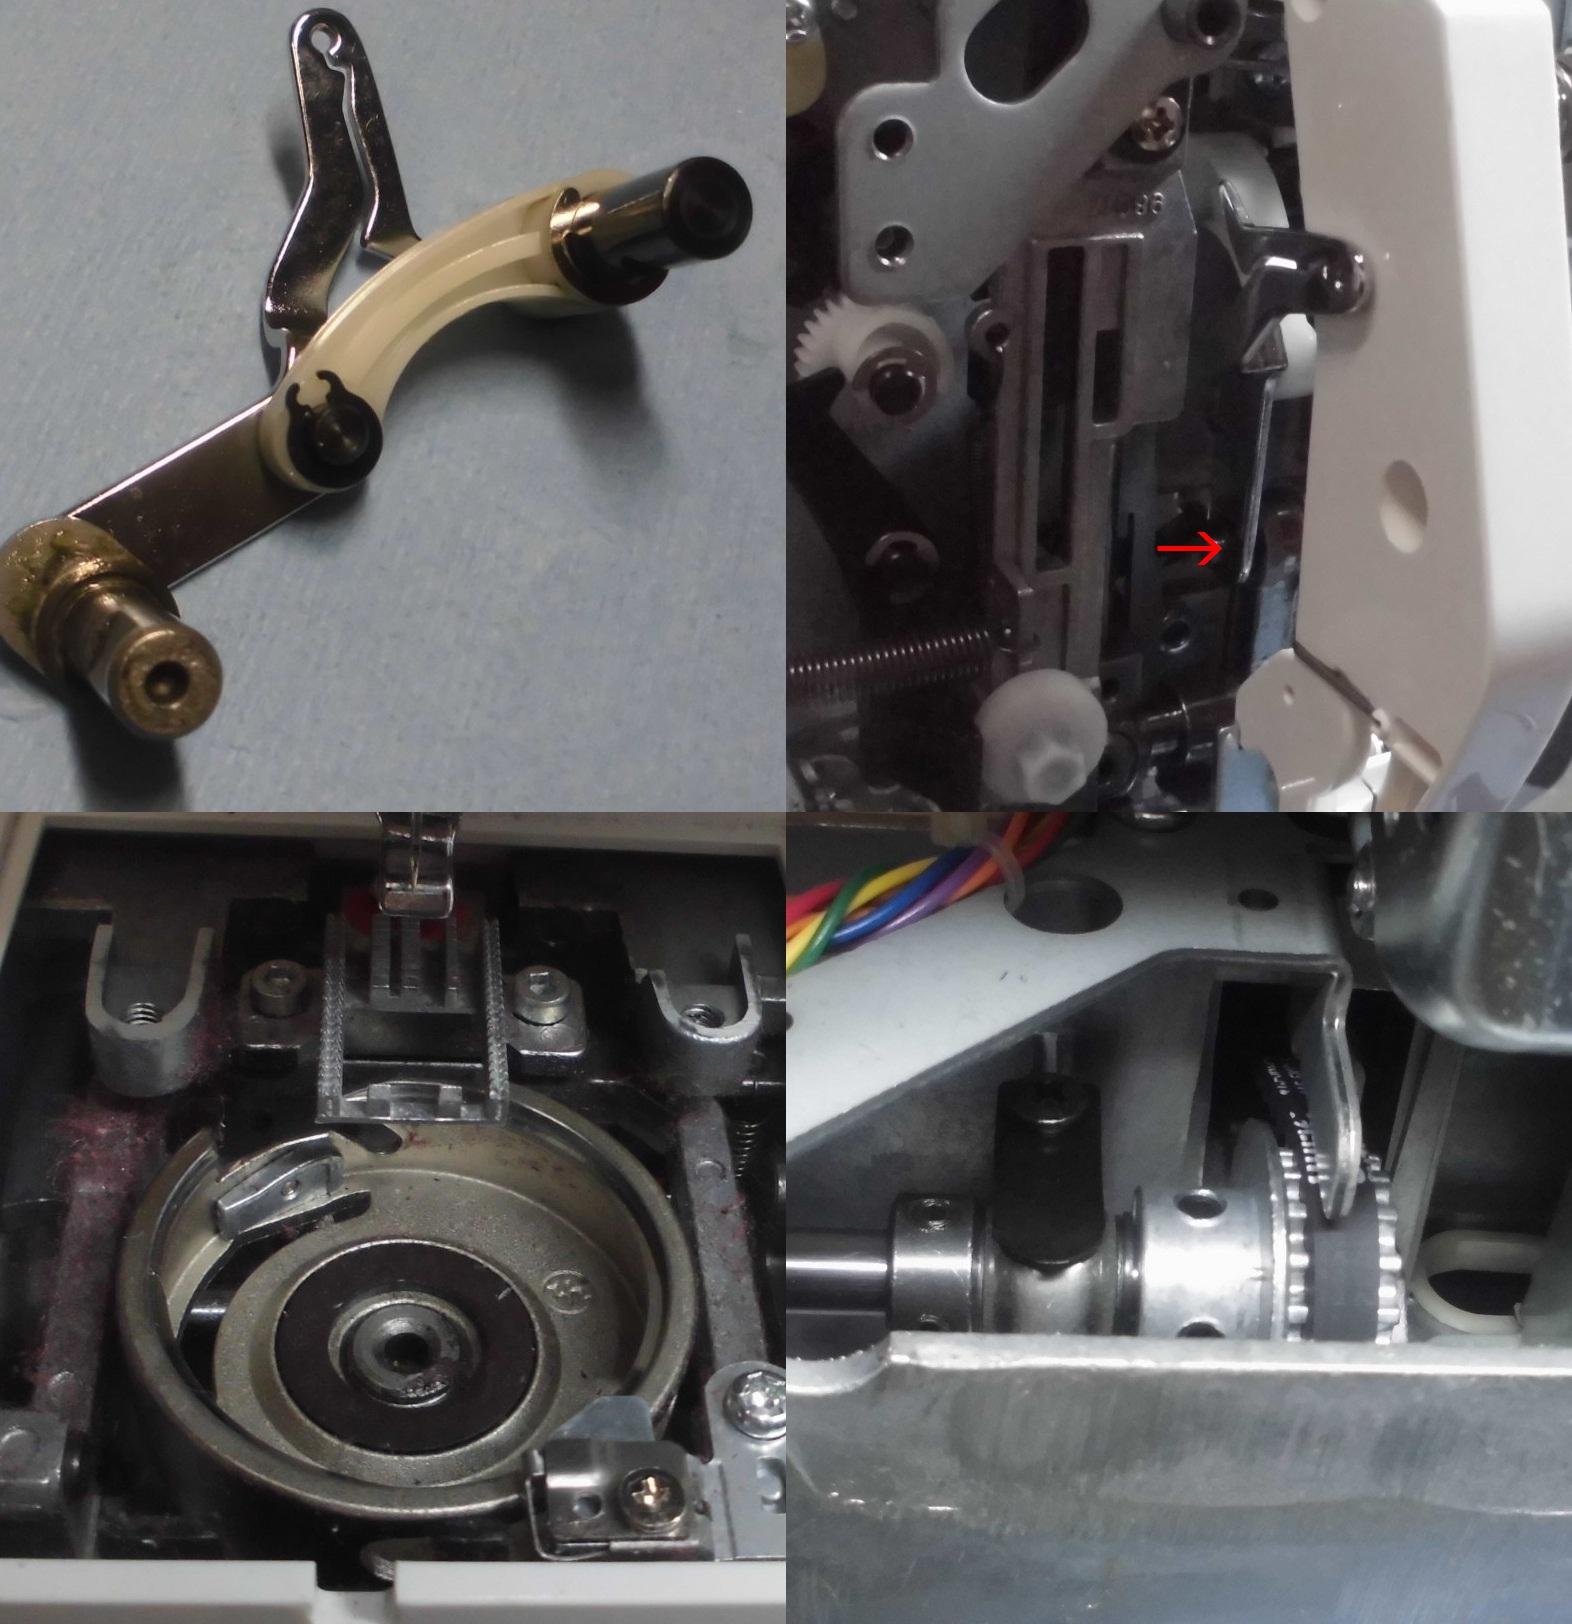 MM-115Pの故障や不具合 縫えない、縫い目が飛ぶ、糸調子不良、部品の破損